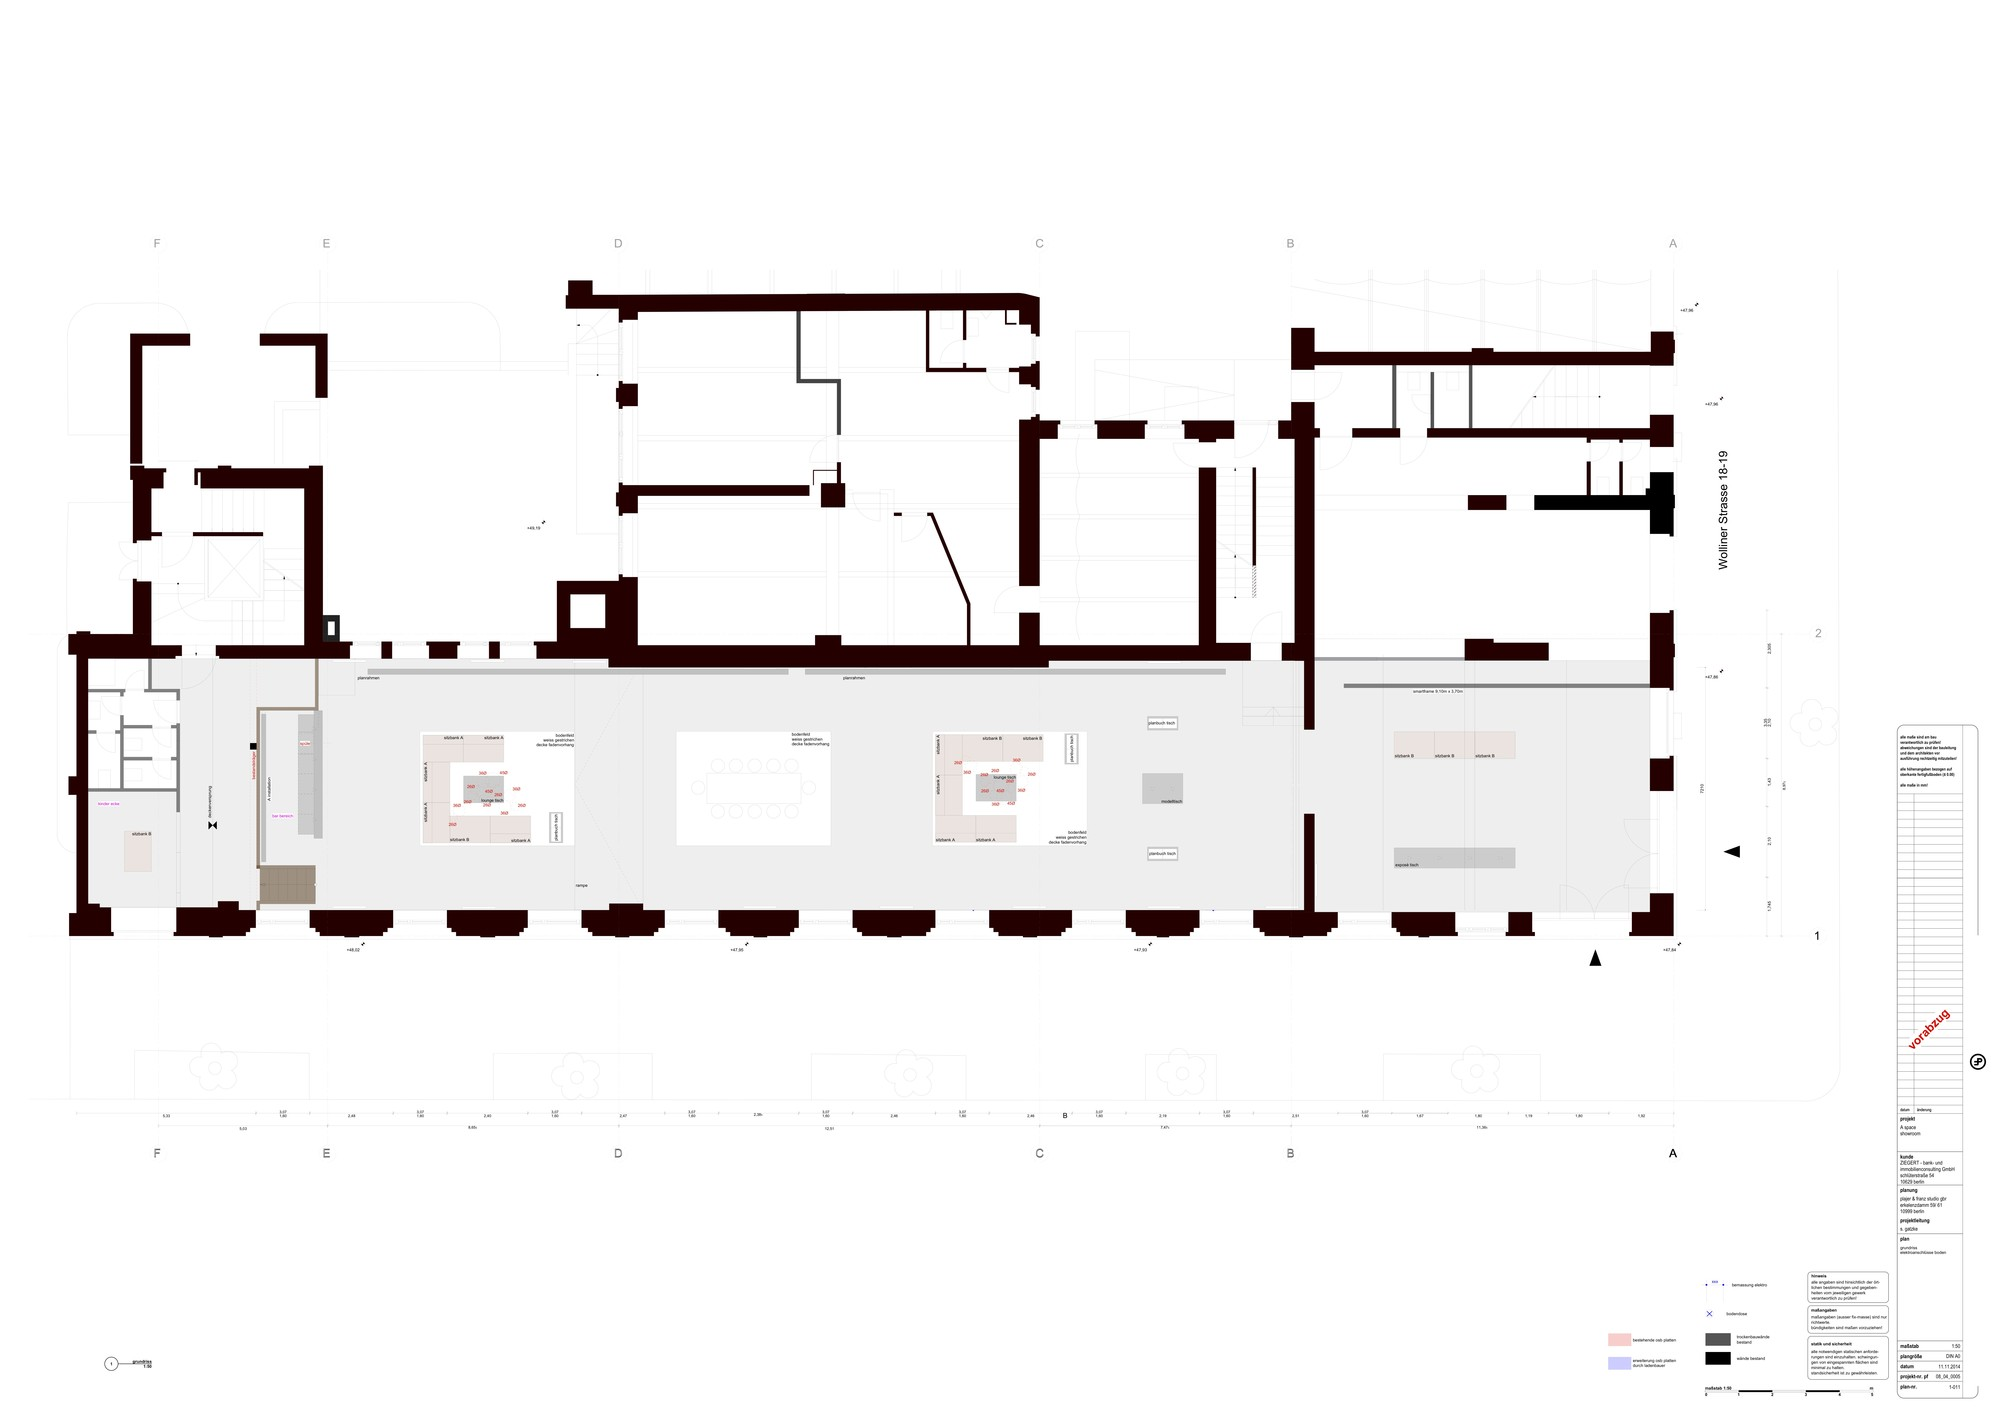 Floor Plan With Loft A Space Lofts In Berlin Mitte Plajer Amp Franz Studio